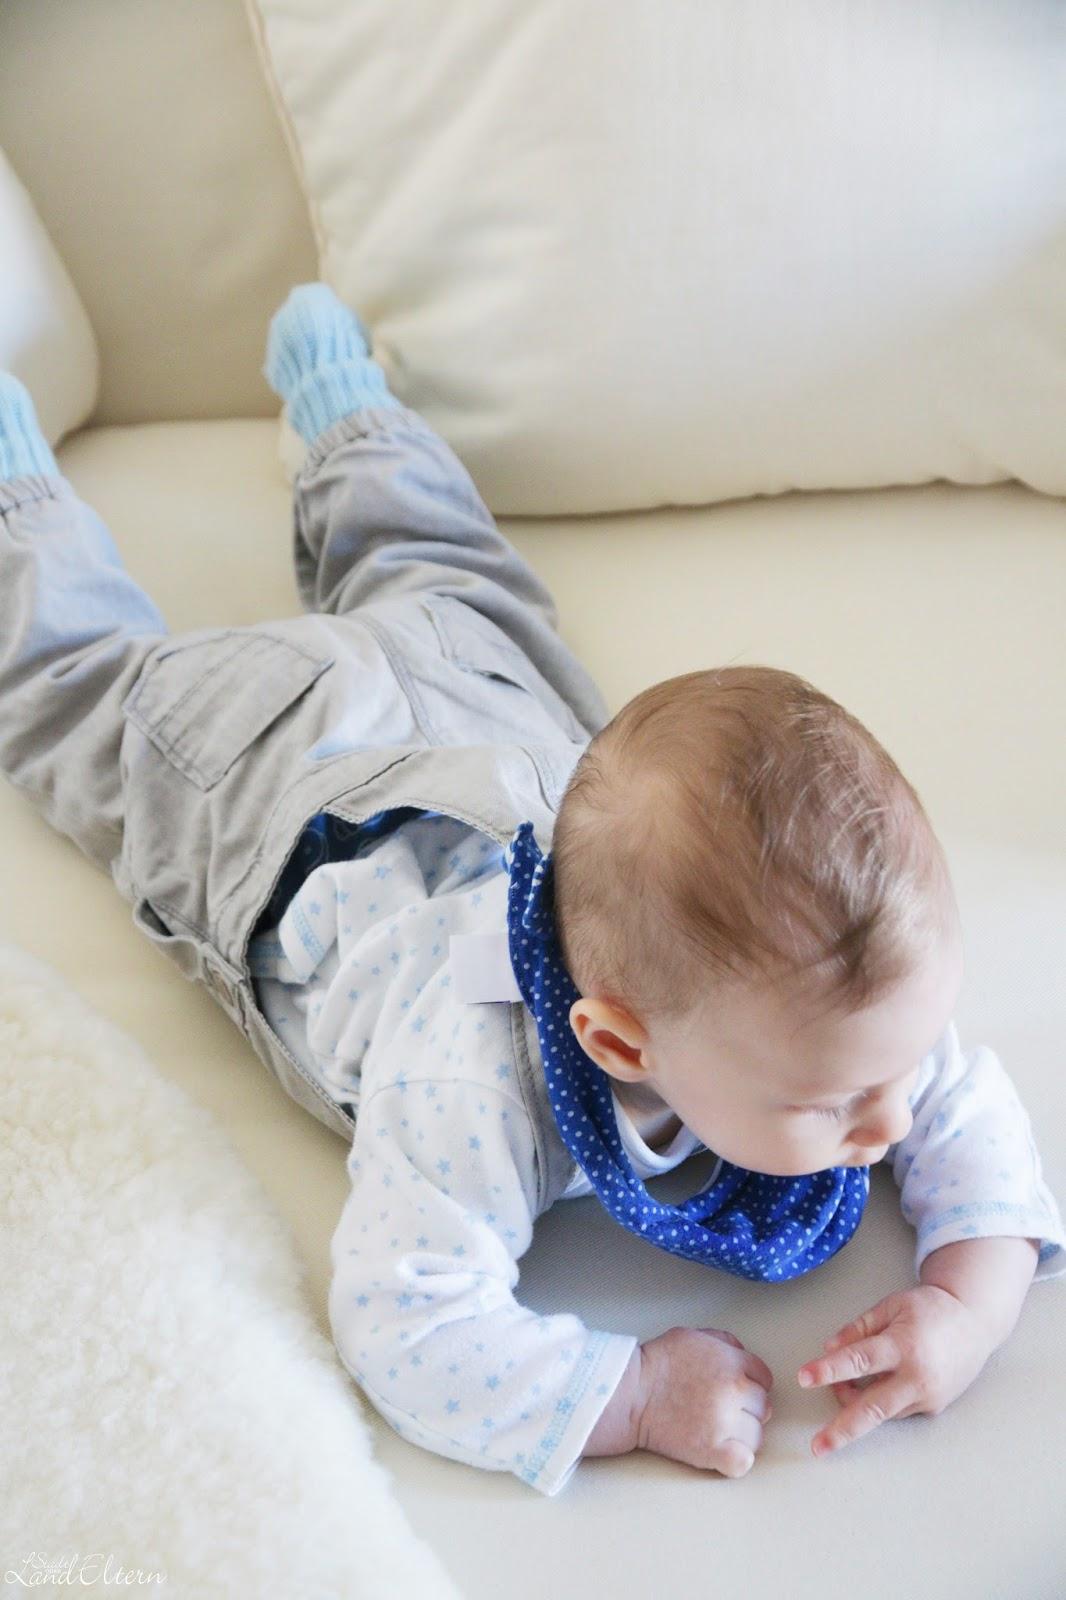 21 wochen baby ju. Black Bedroom Furniture Sets. Home Design Ideas